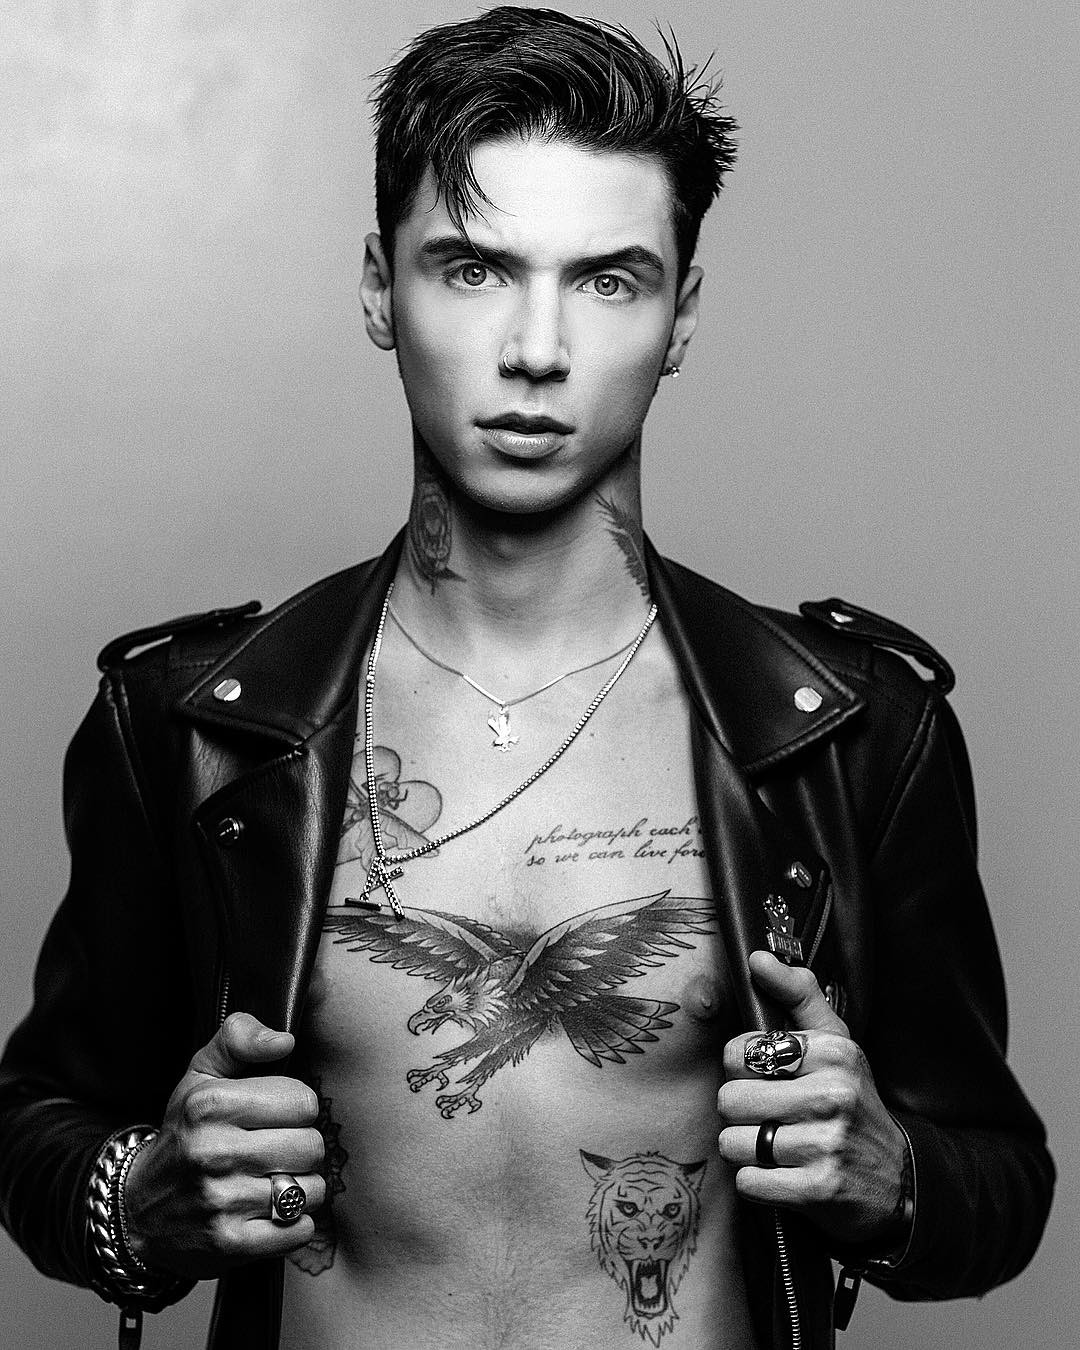 andy biersack tattoos